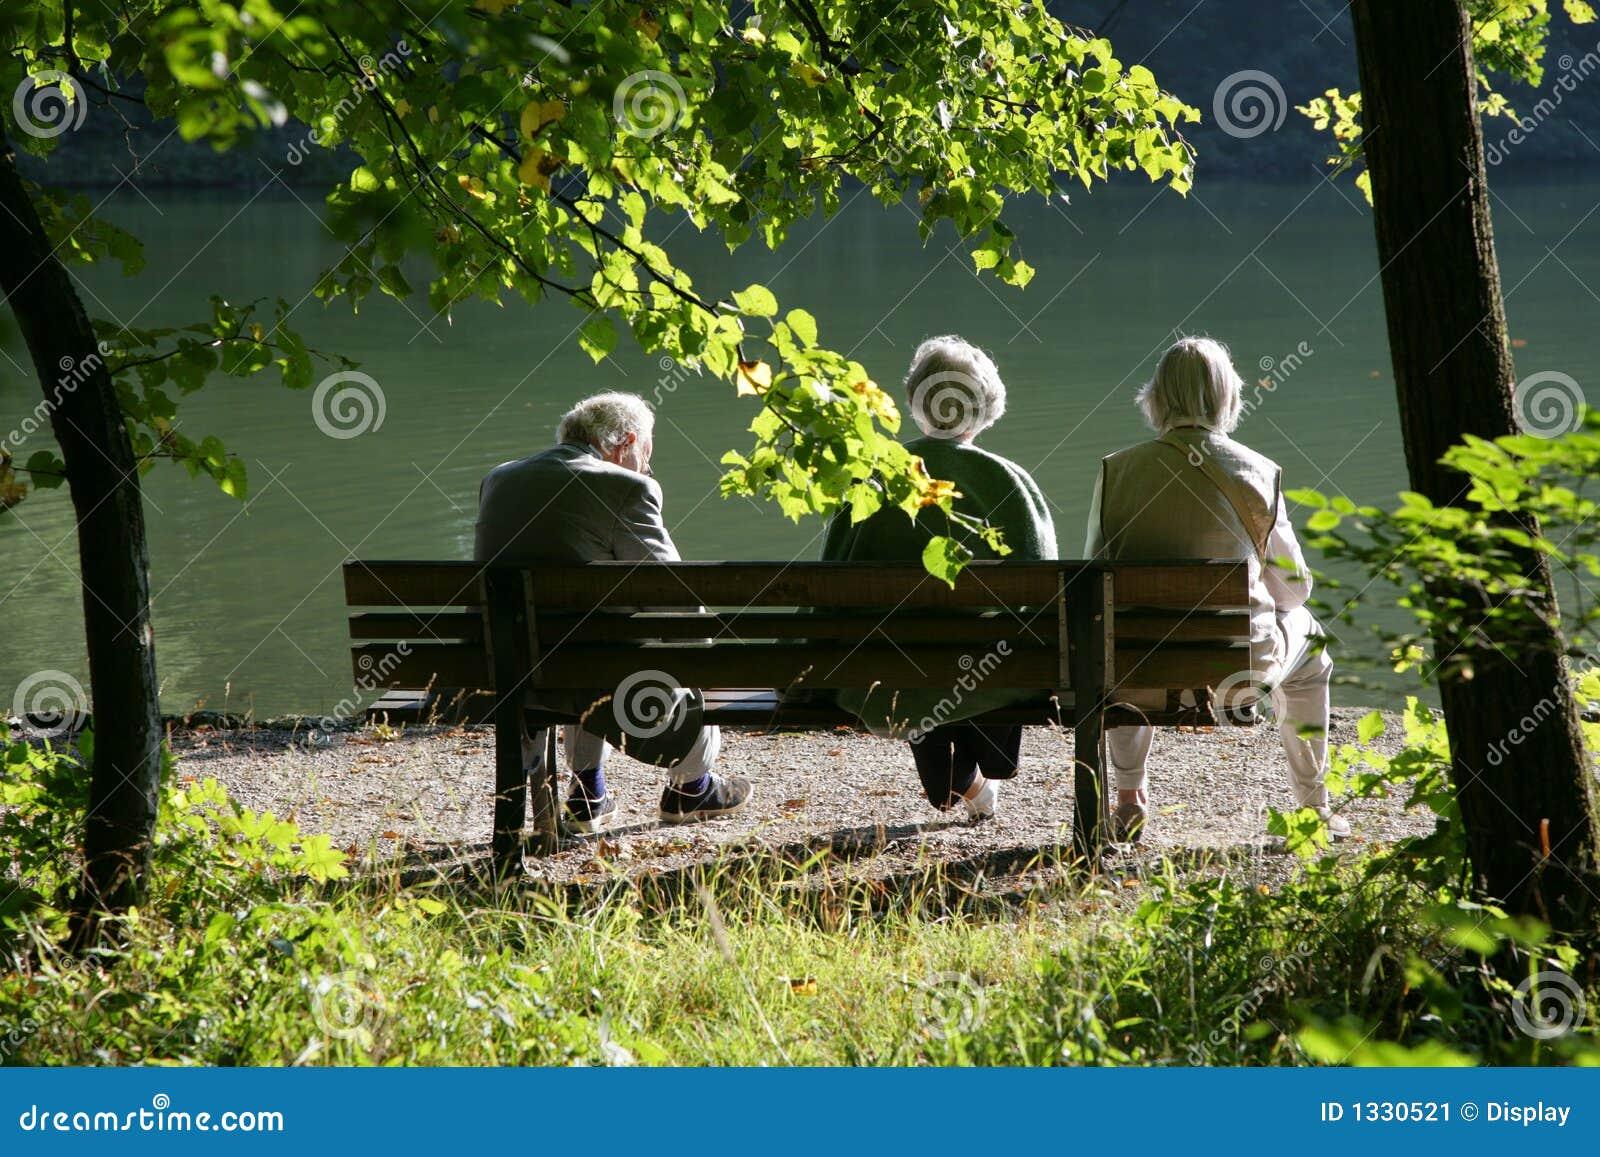 Seniors on a park bench